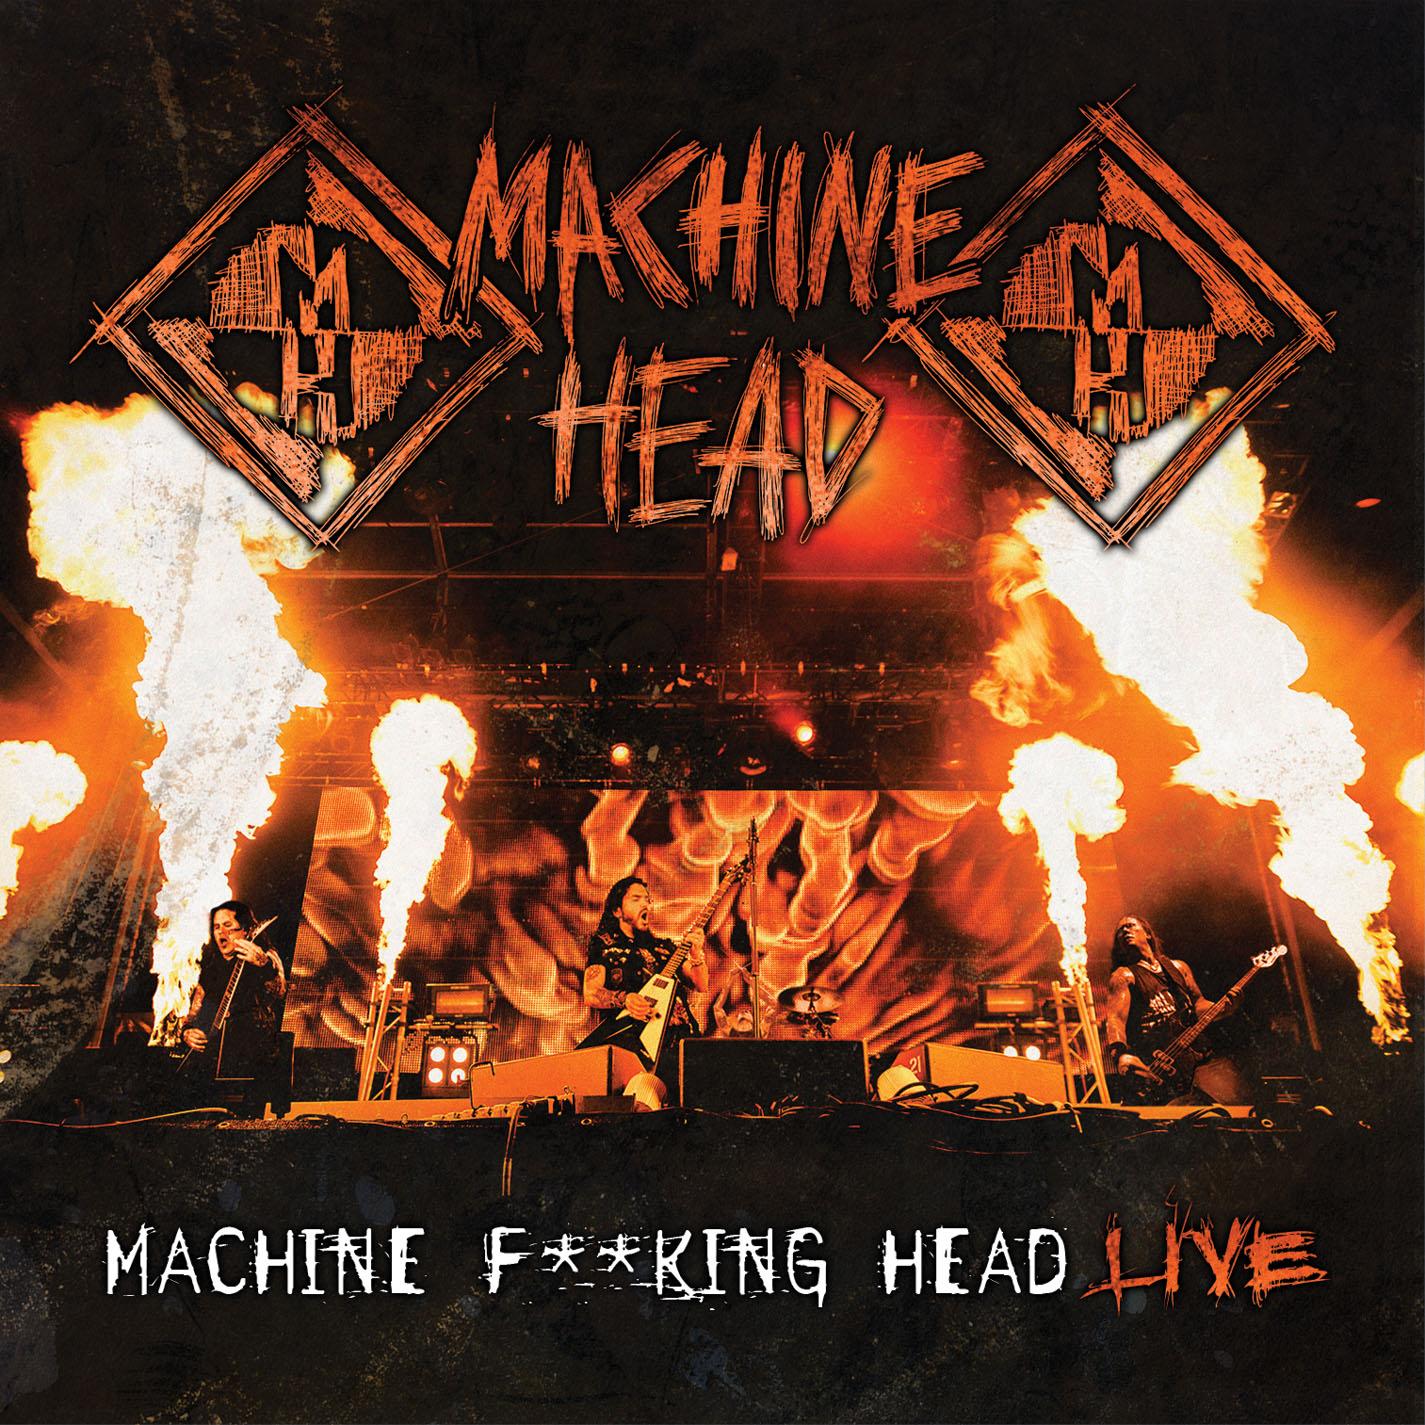 Machine Head - Machine F**king Head Live